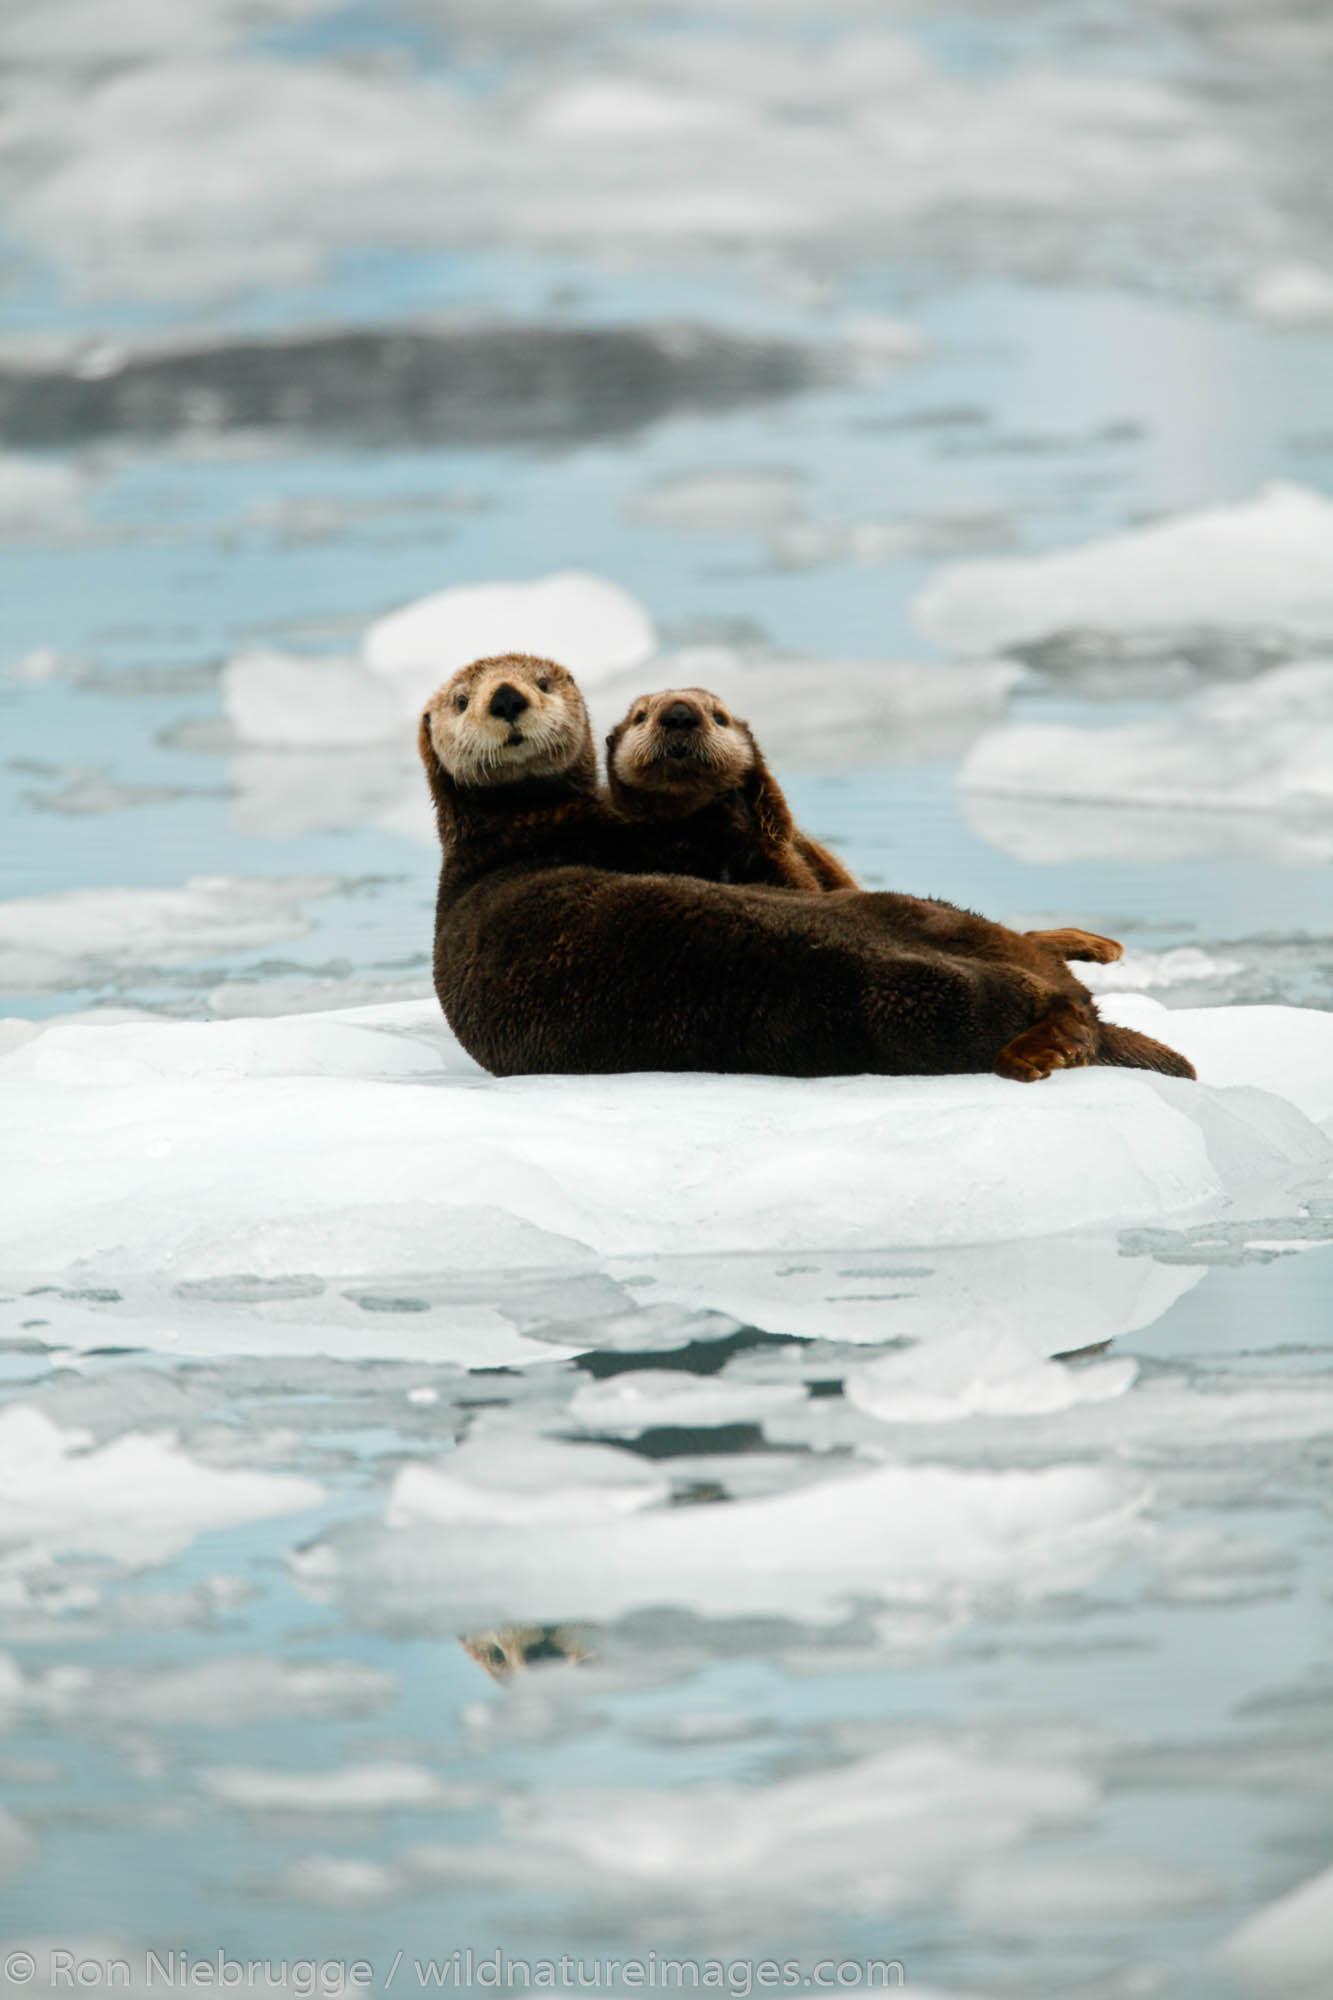 Chugach National Forest, Alaska Chugach, Sea Otter, photo